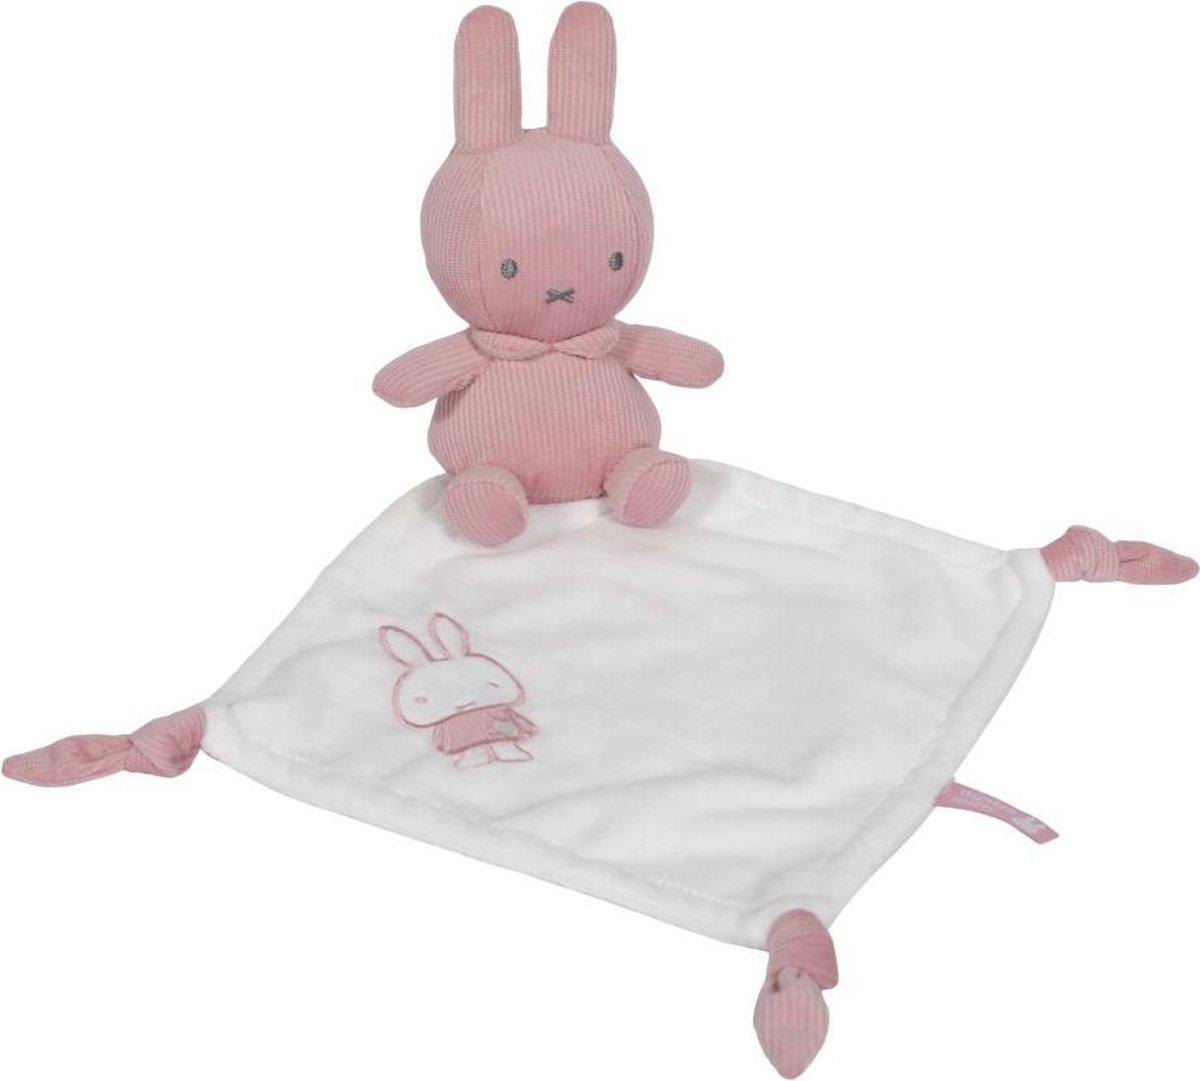 Tiamo Collection Knuffeldoekje nijntje - pink baby rib